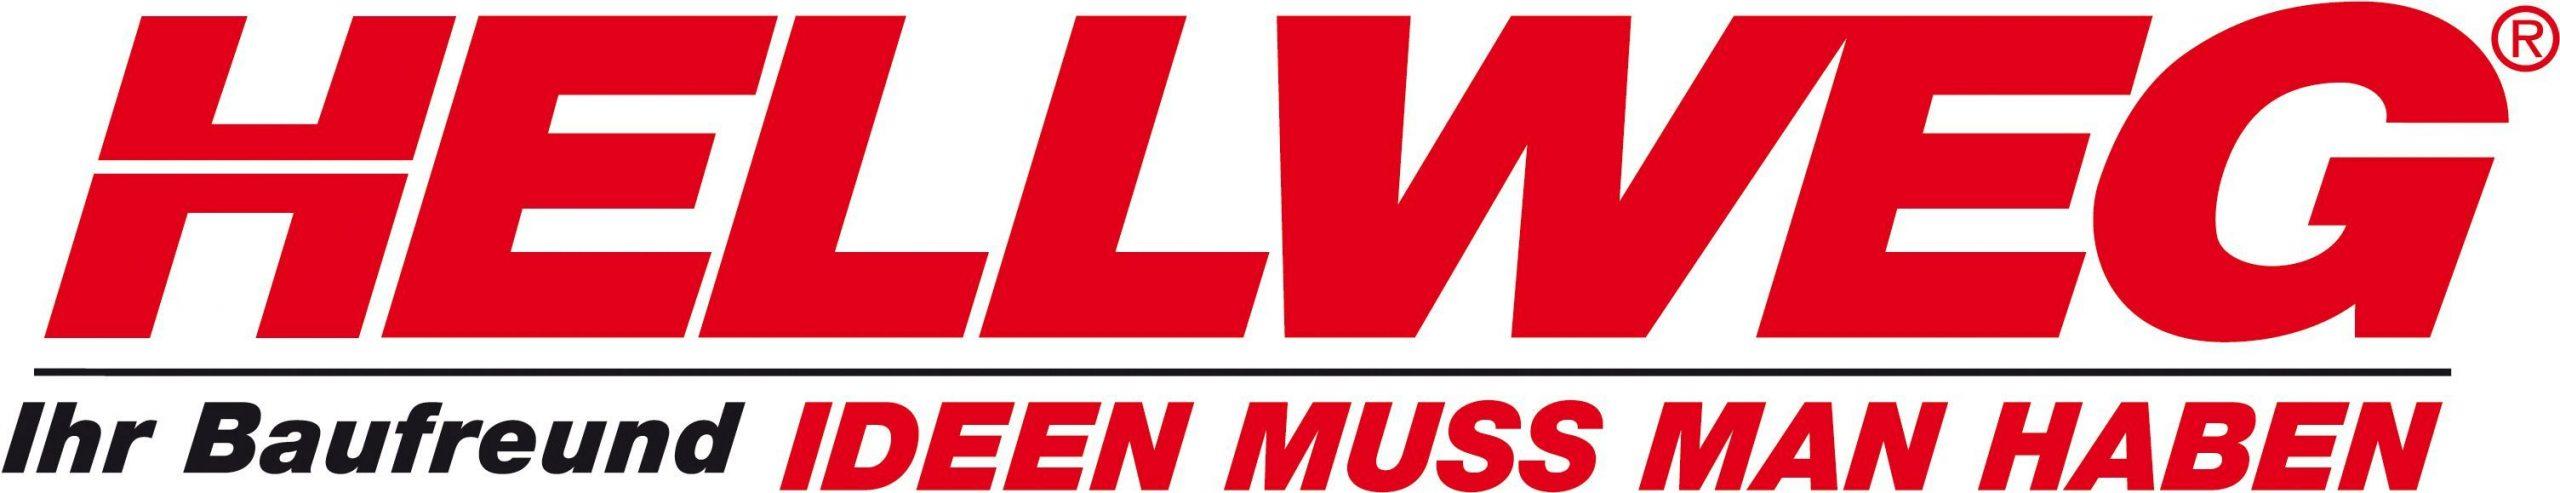 Hellweg-Logo (002)